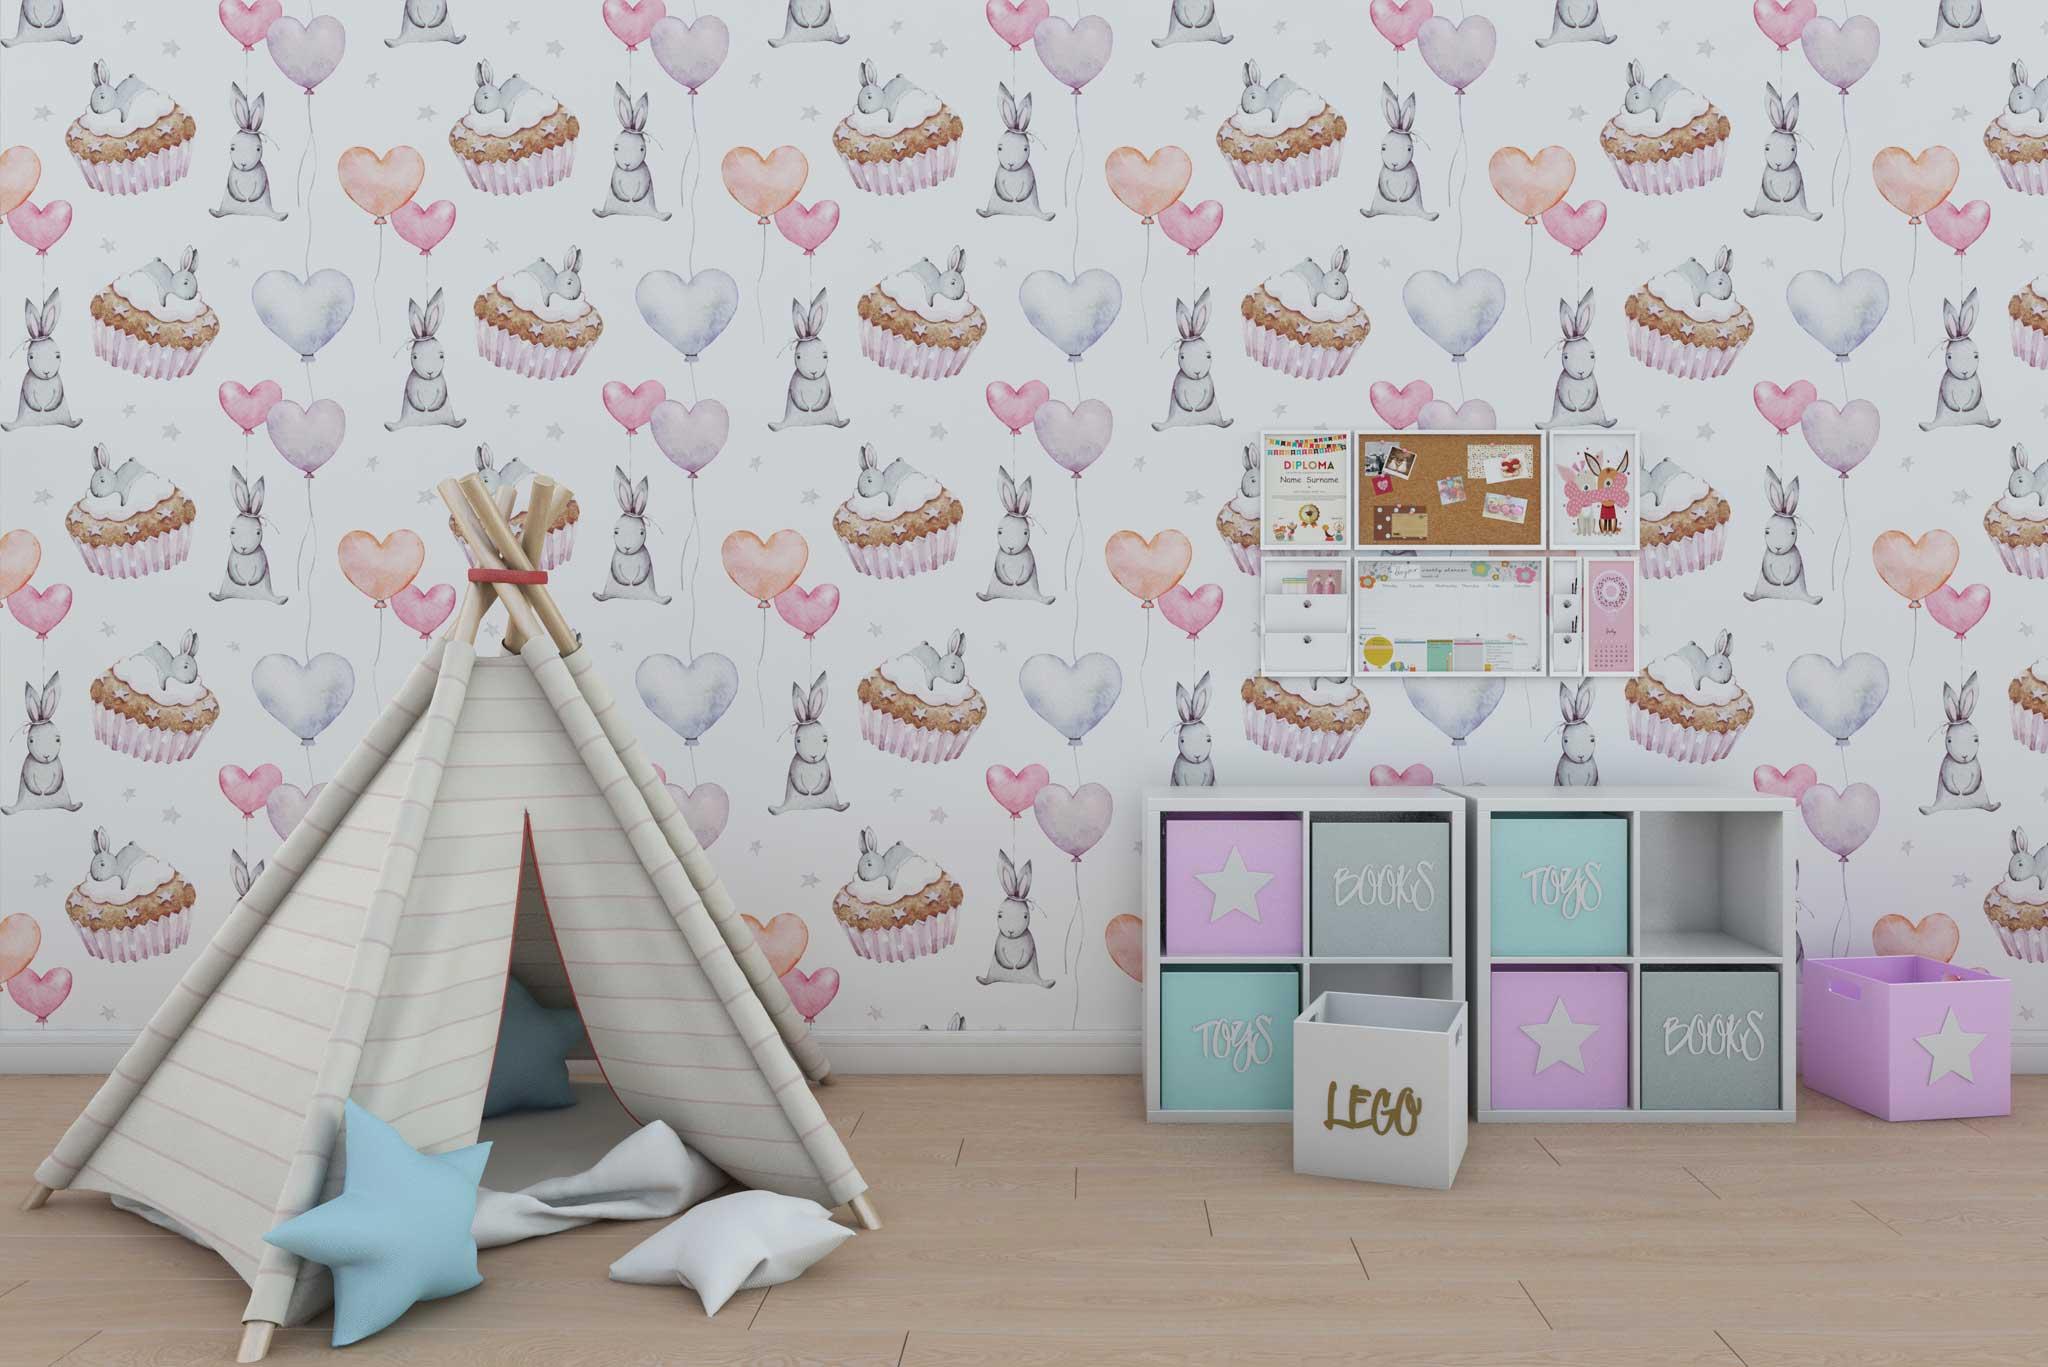 tapet-fototapet-design-personalizat-customizabil-comanda-special-camera-dormitor-copii-model-iepurasi-inimi-prajituri-culoare-roz-alb